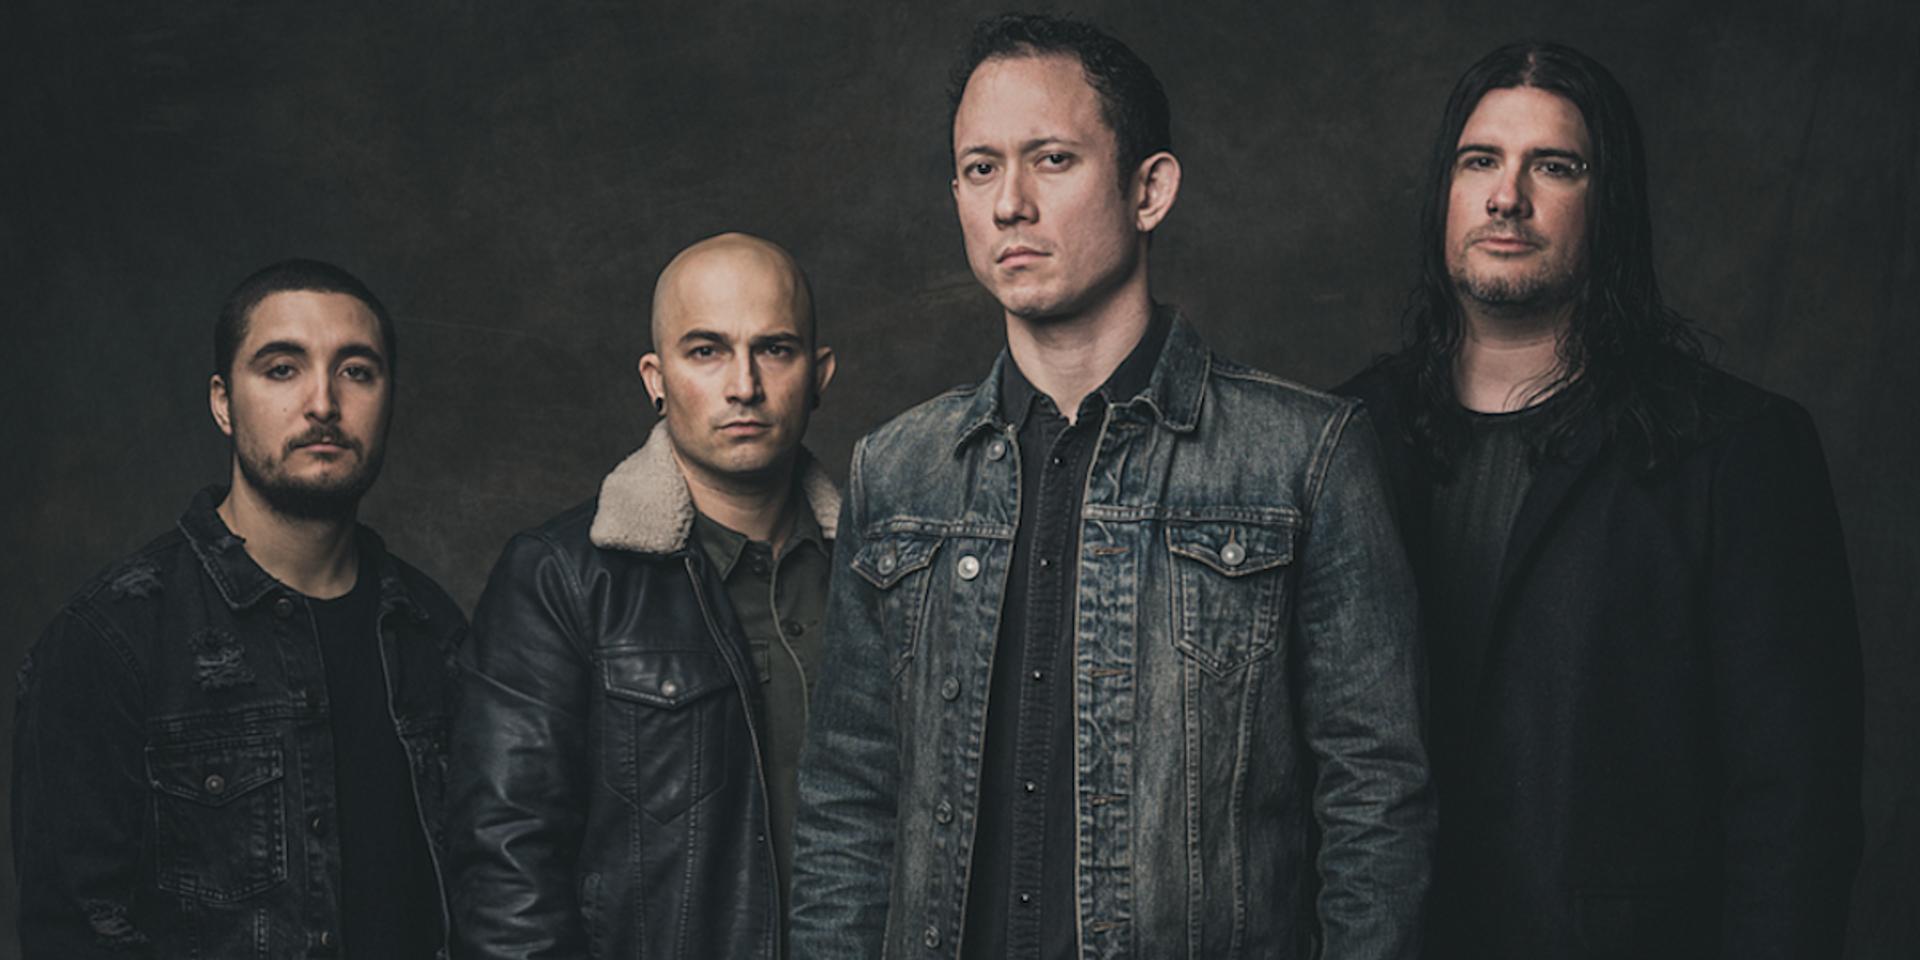 Trivium announce new album, release first single 'Catastrophist' – listen